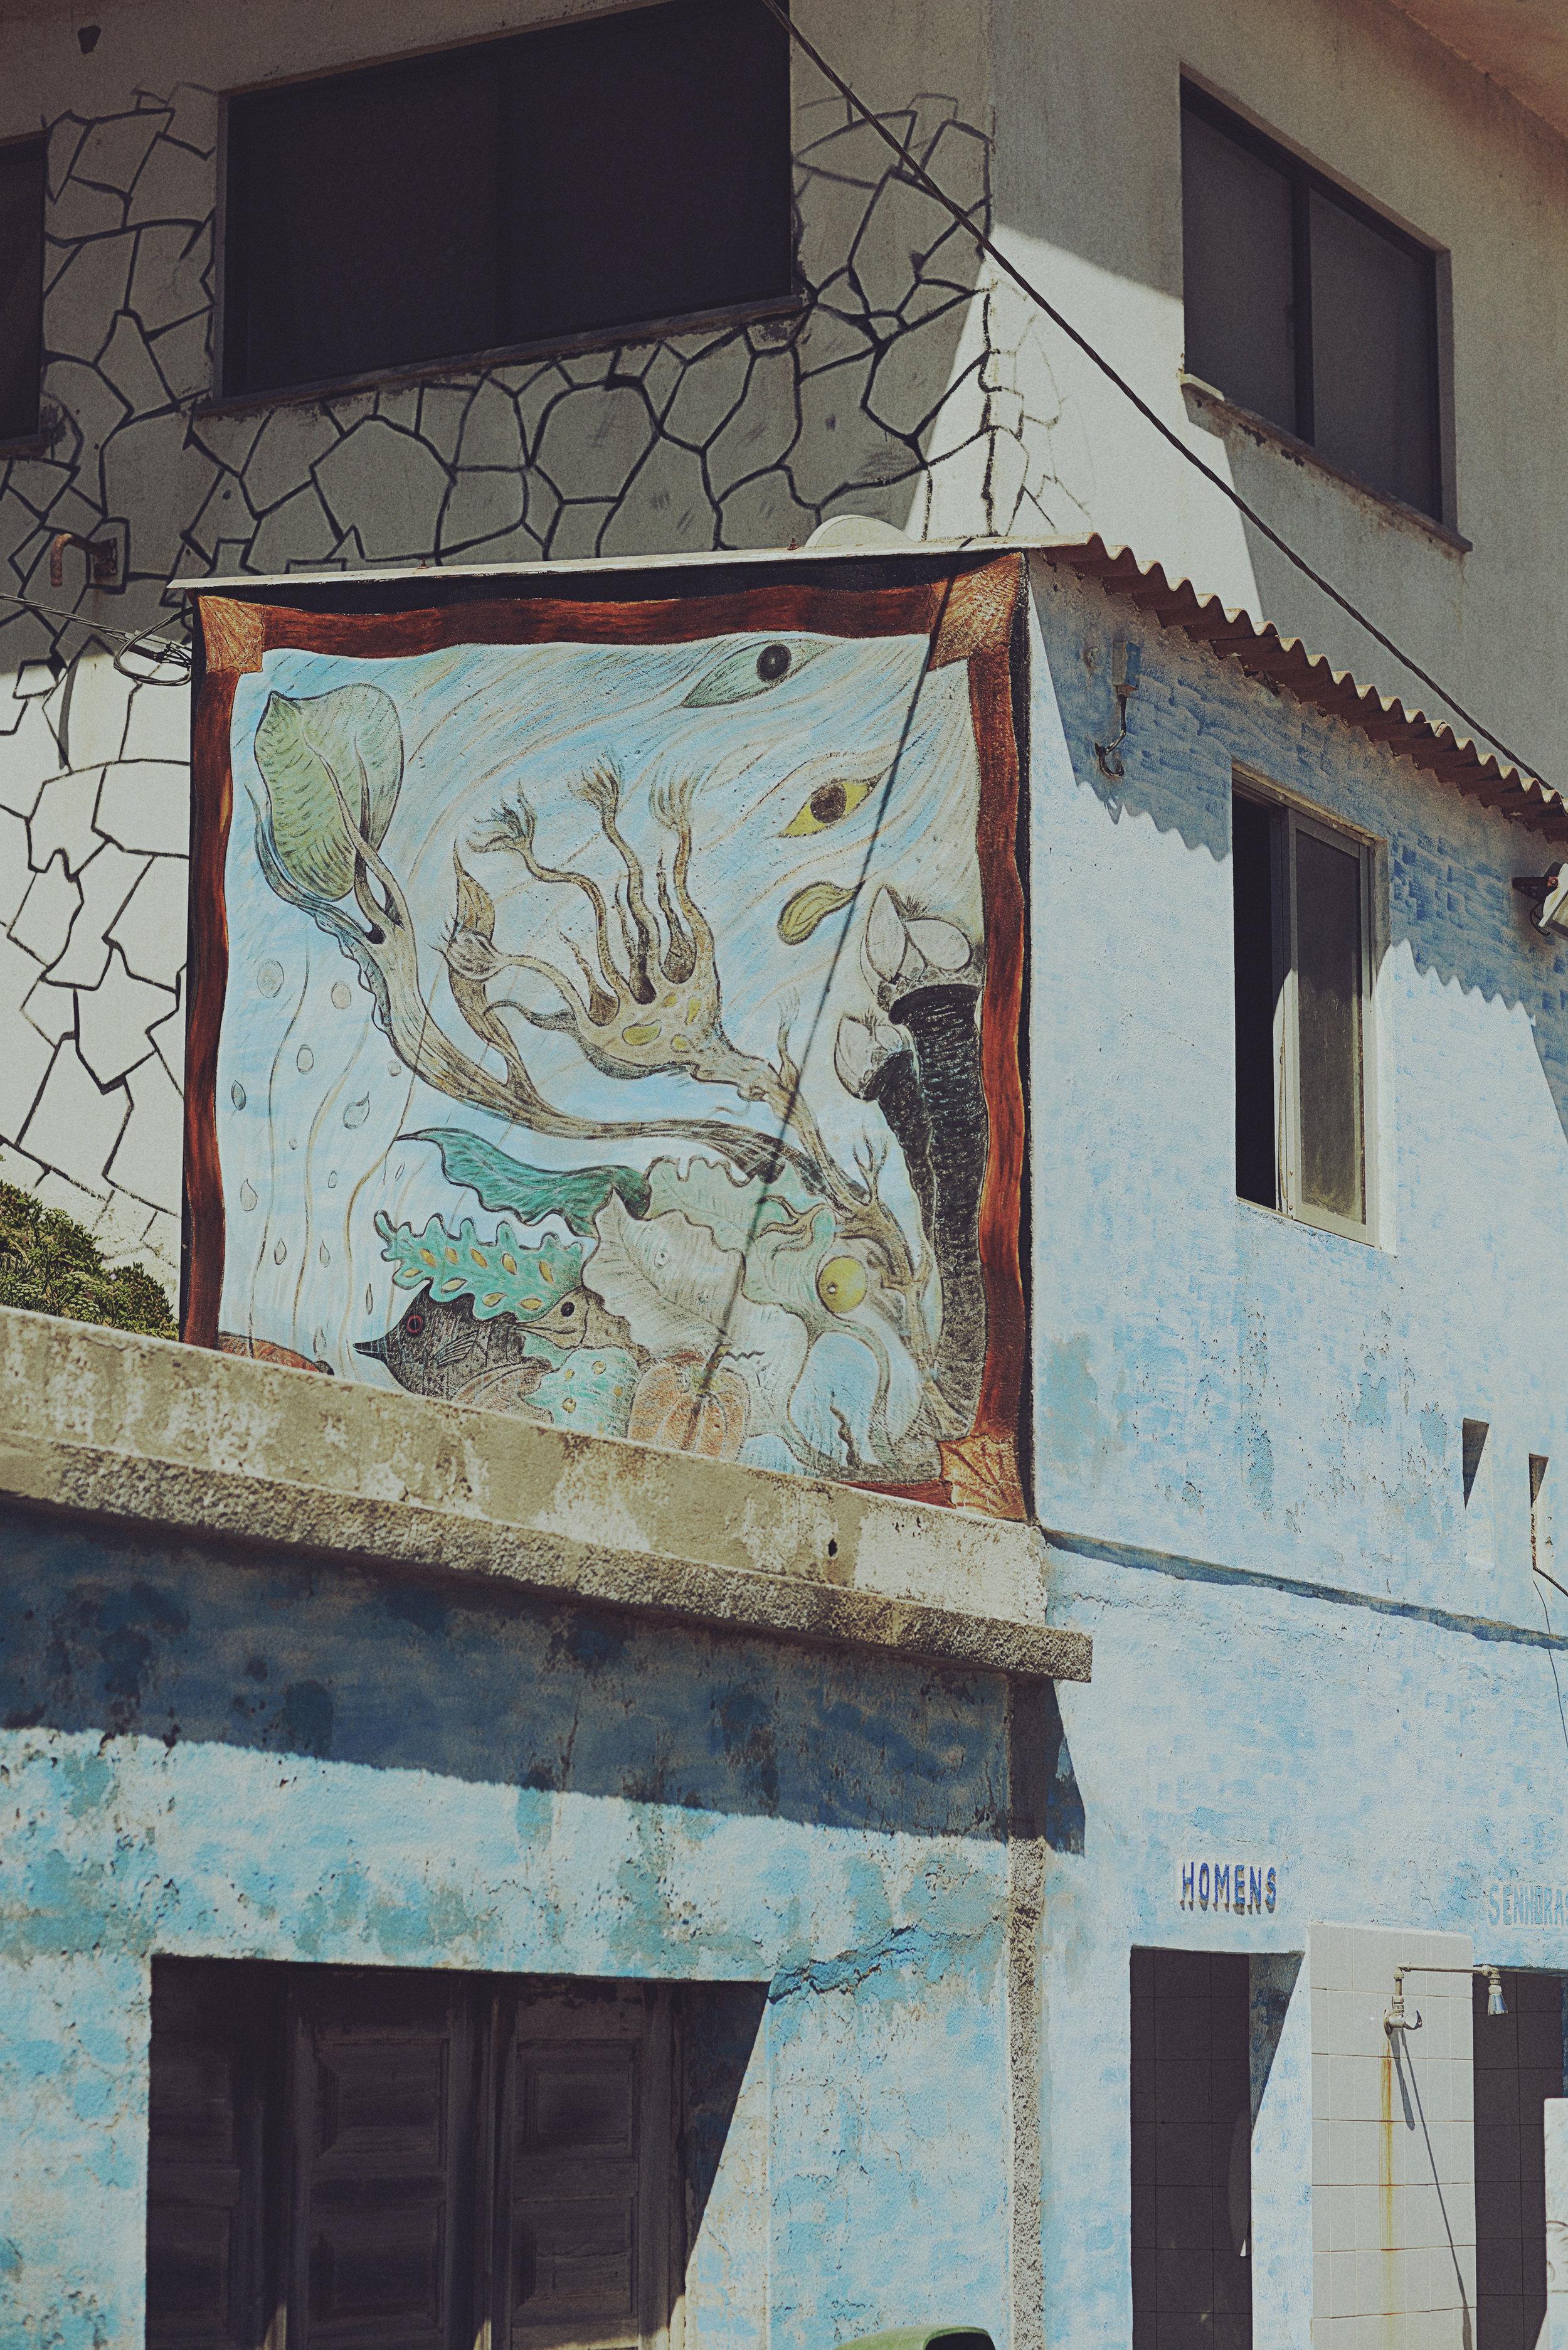 BuiltThenBurn_Portugal_LenaBoreux_Photos©DavidANDRE-DSC_6897 (1).jpg